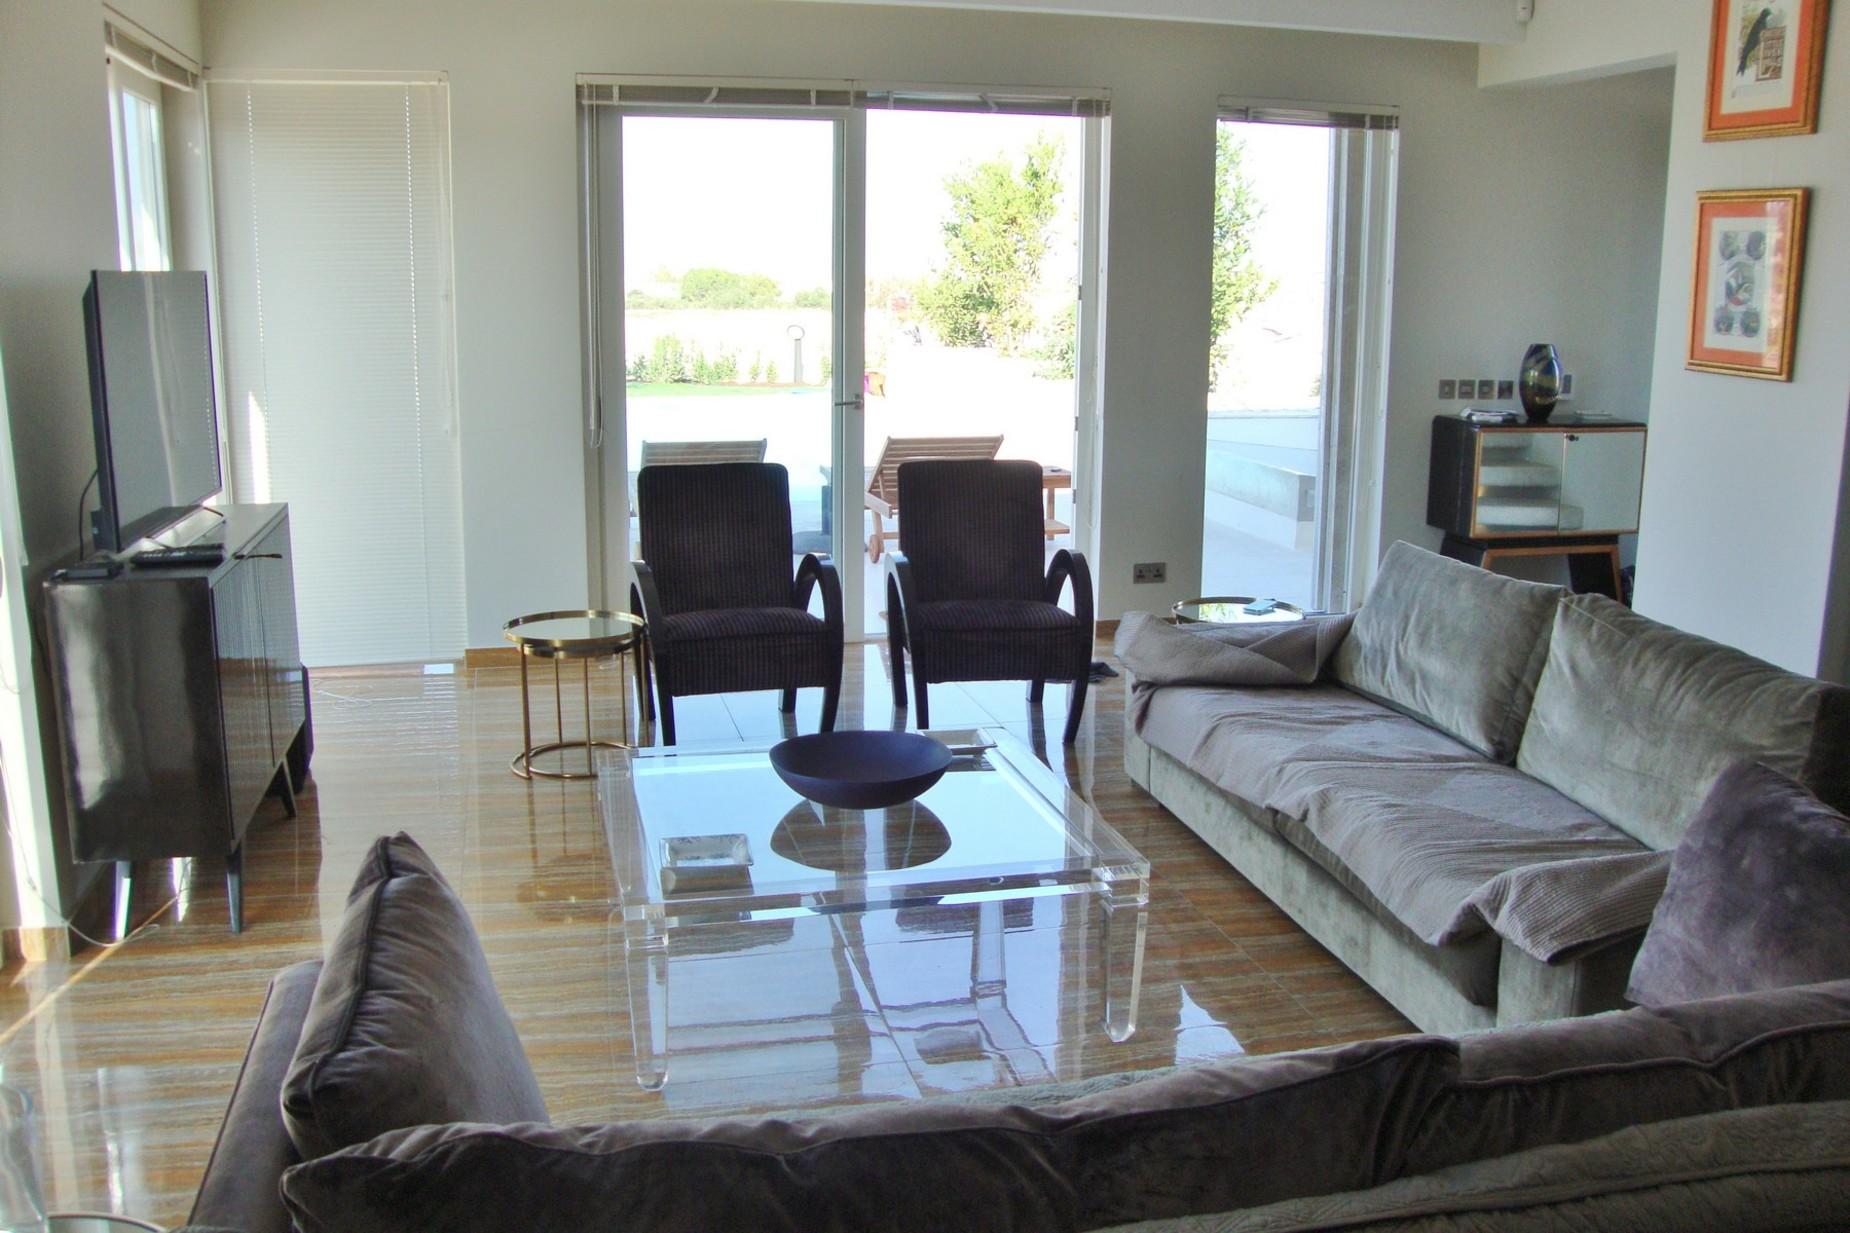 3 bed Villa For Rent in Siggiewi, Siggiewi - thumb 10